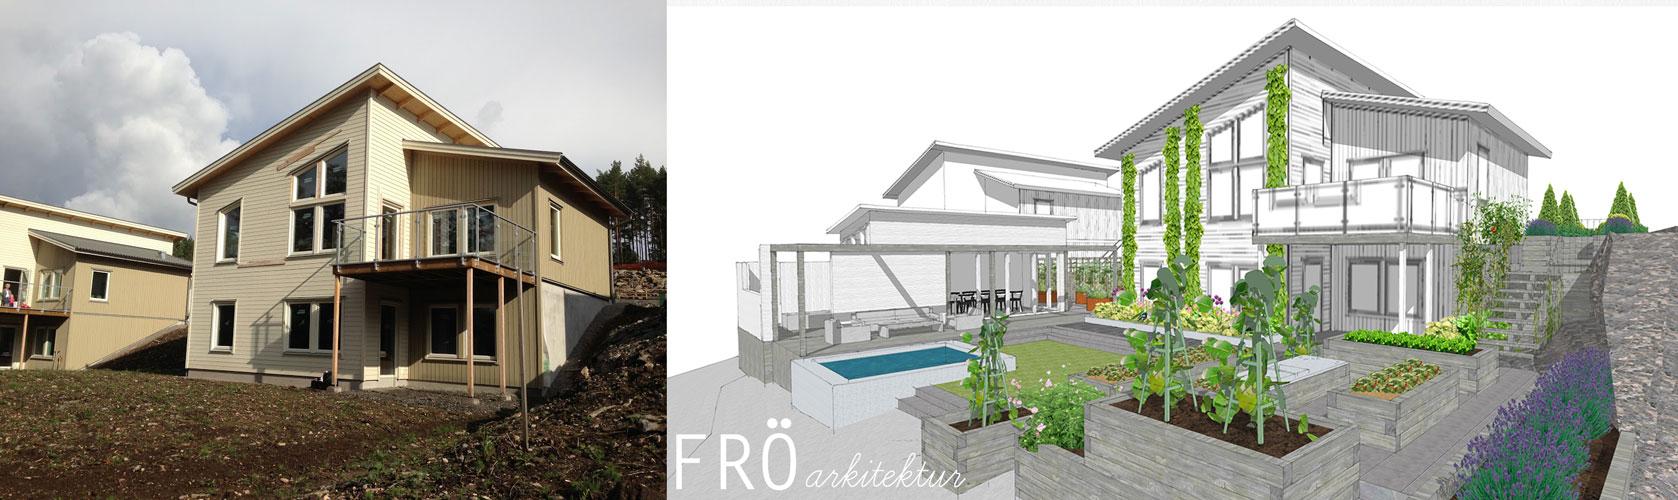 vinterträdgÃ¥rd – FRÖ arkitektur